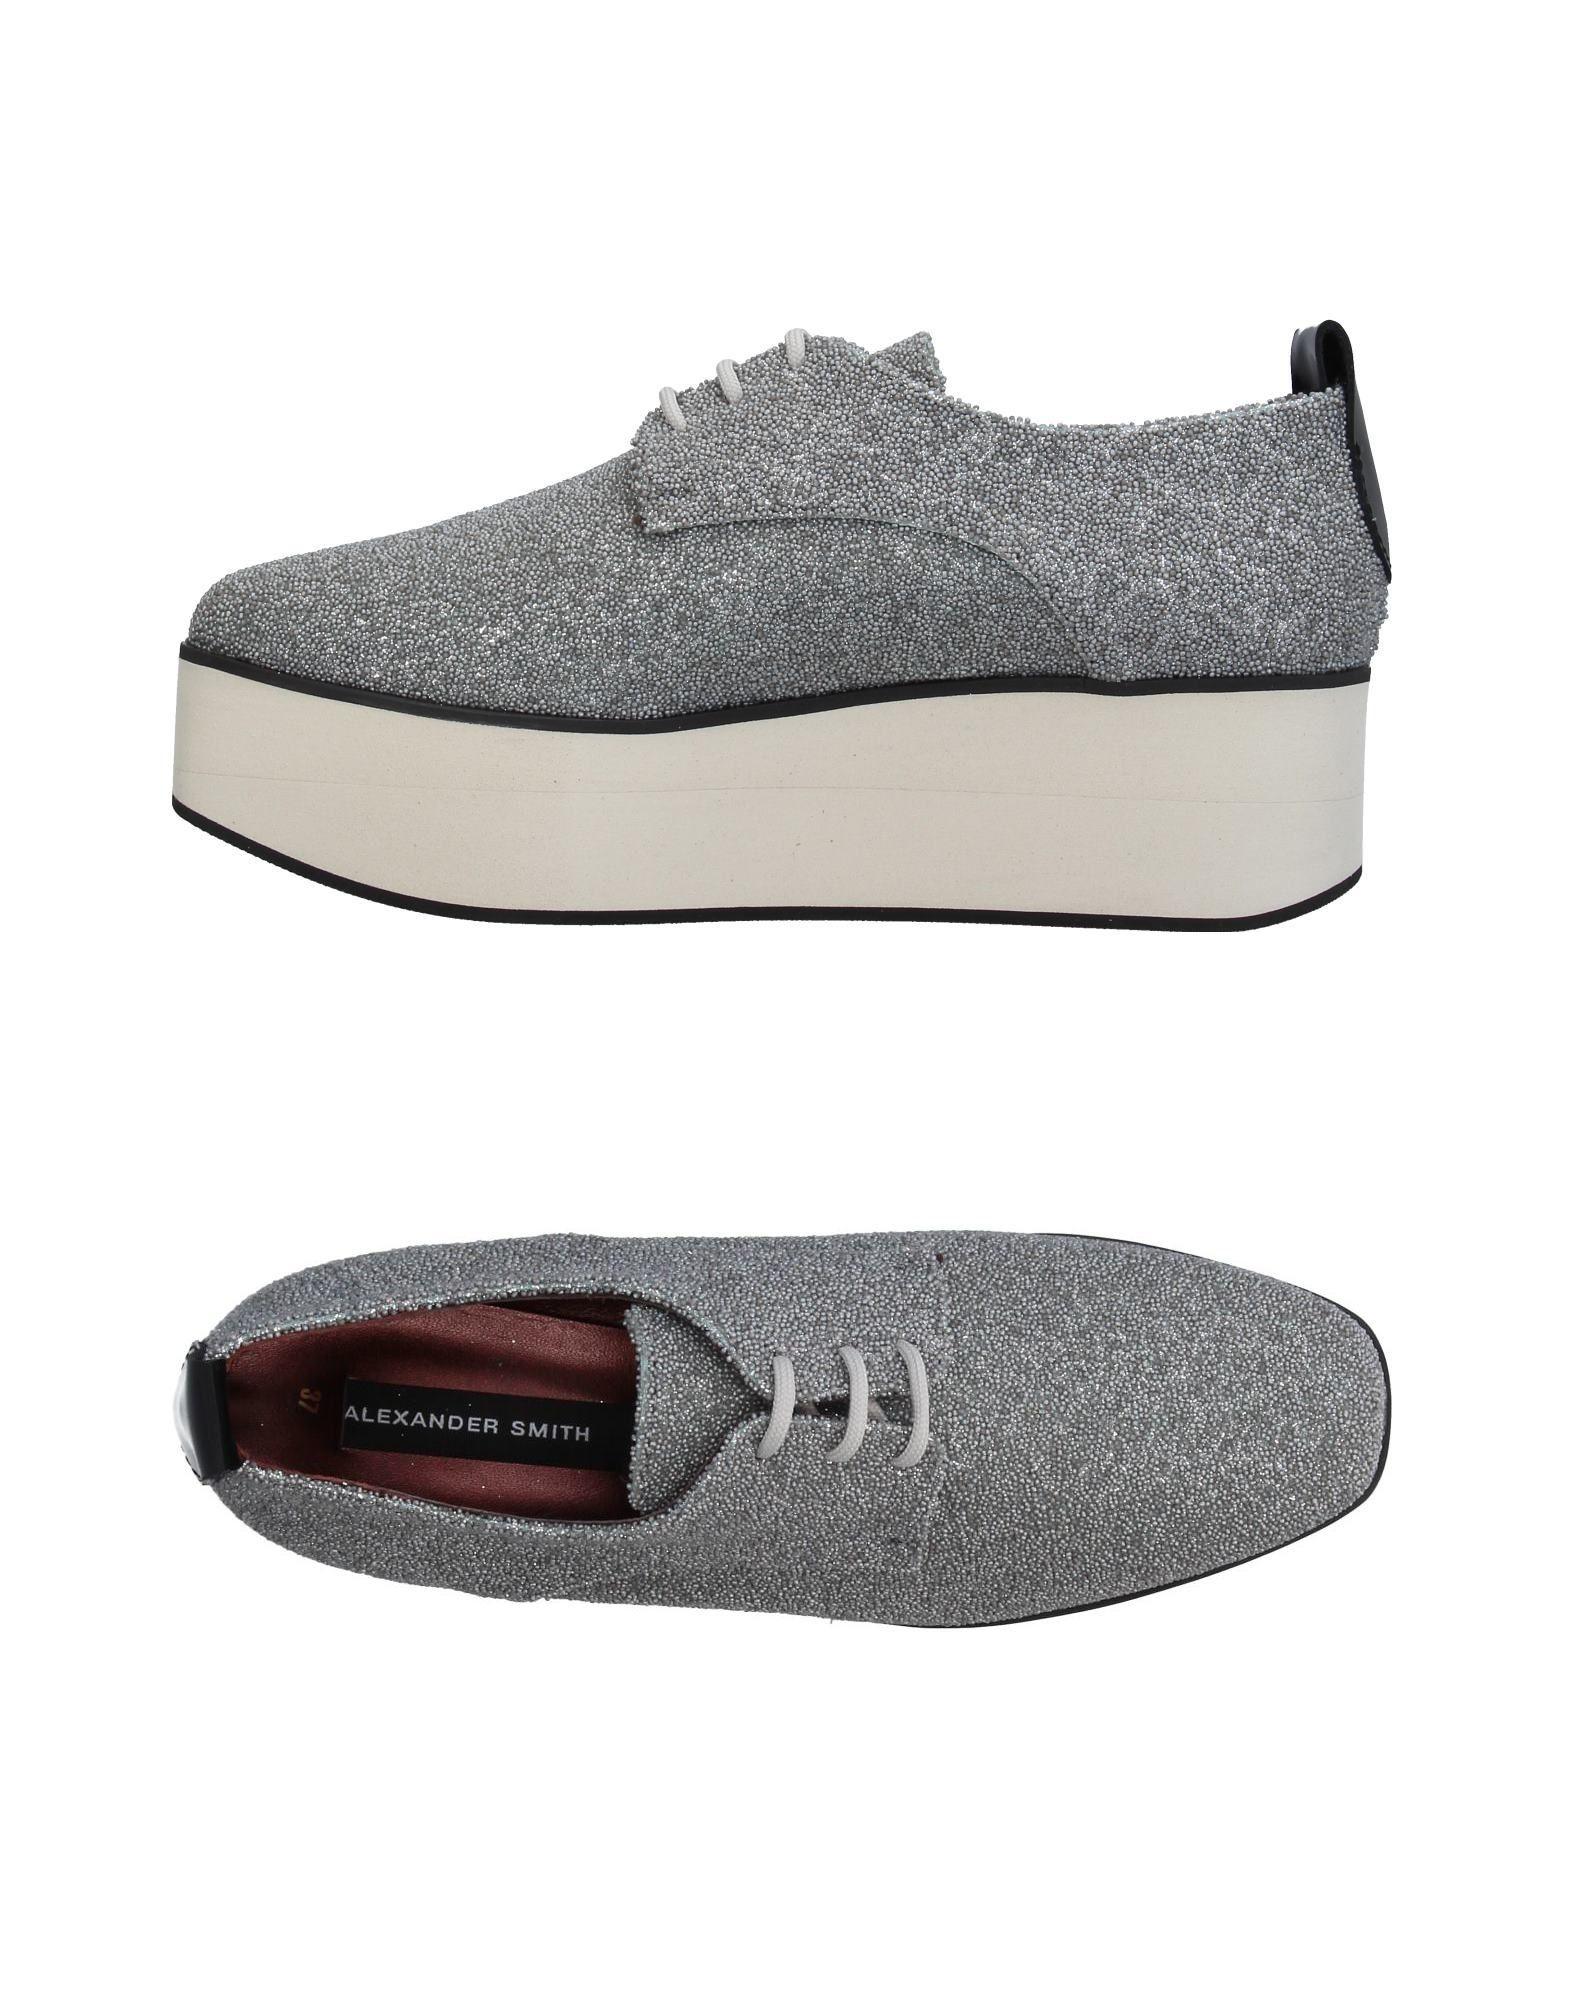 Alexander Smith Schnürschuhe Damen  11385354LN Gute Qualität beliebte Schuhe